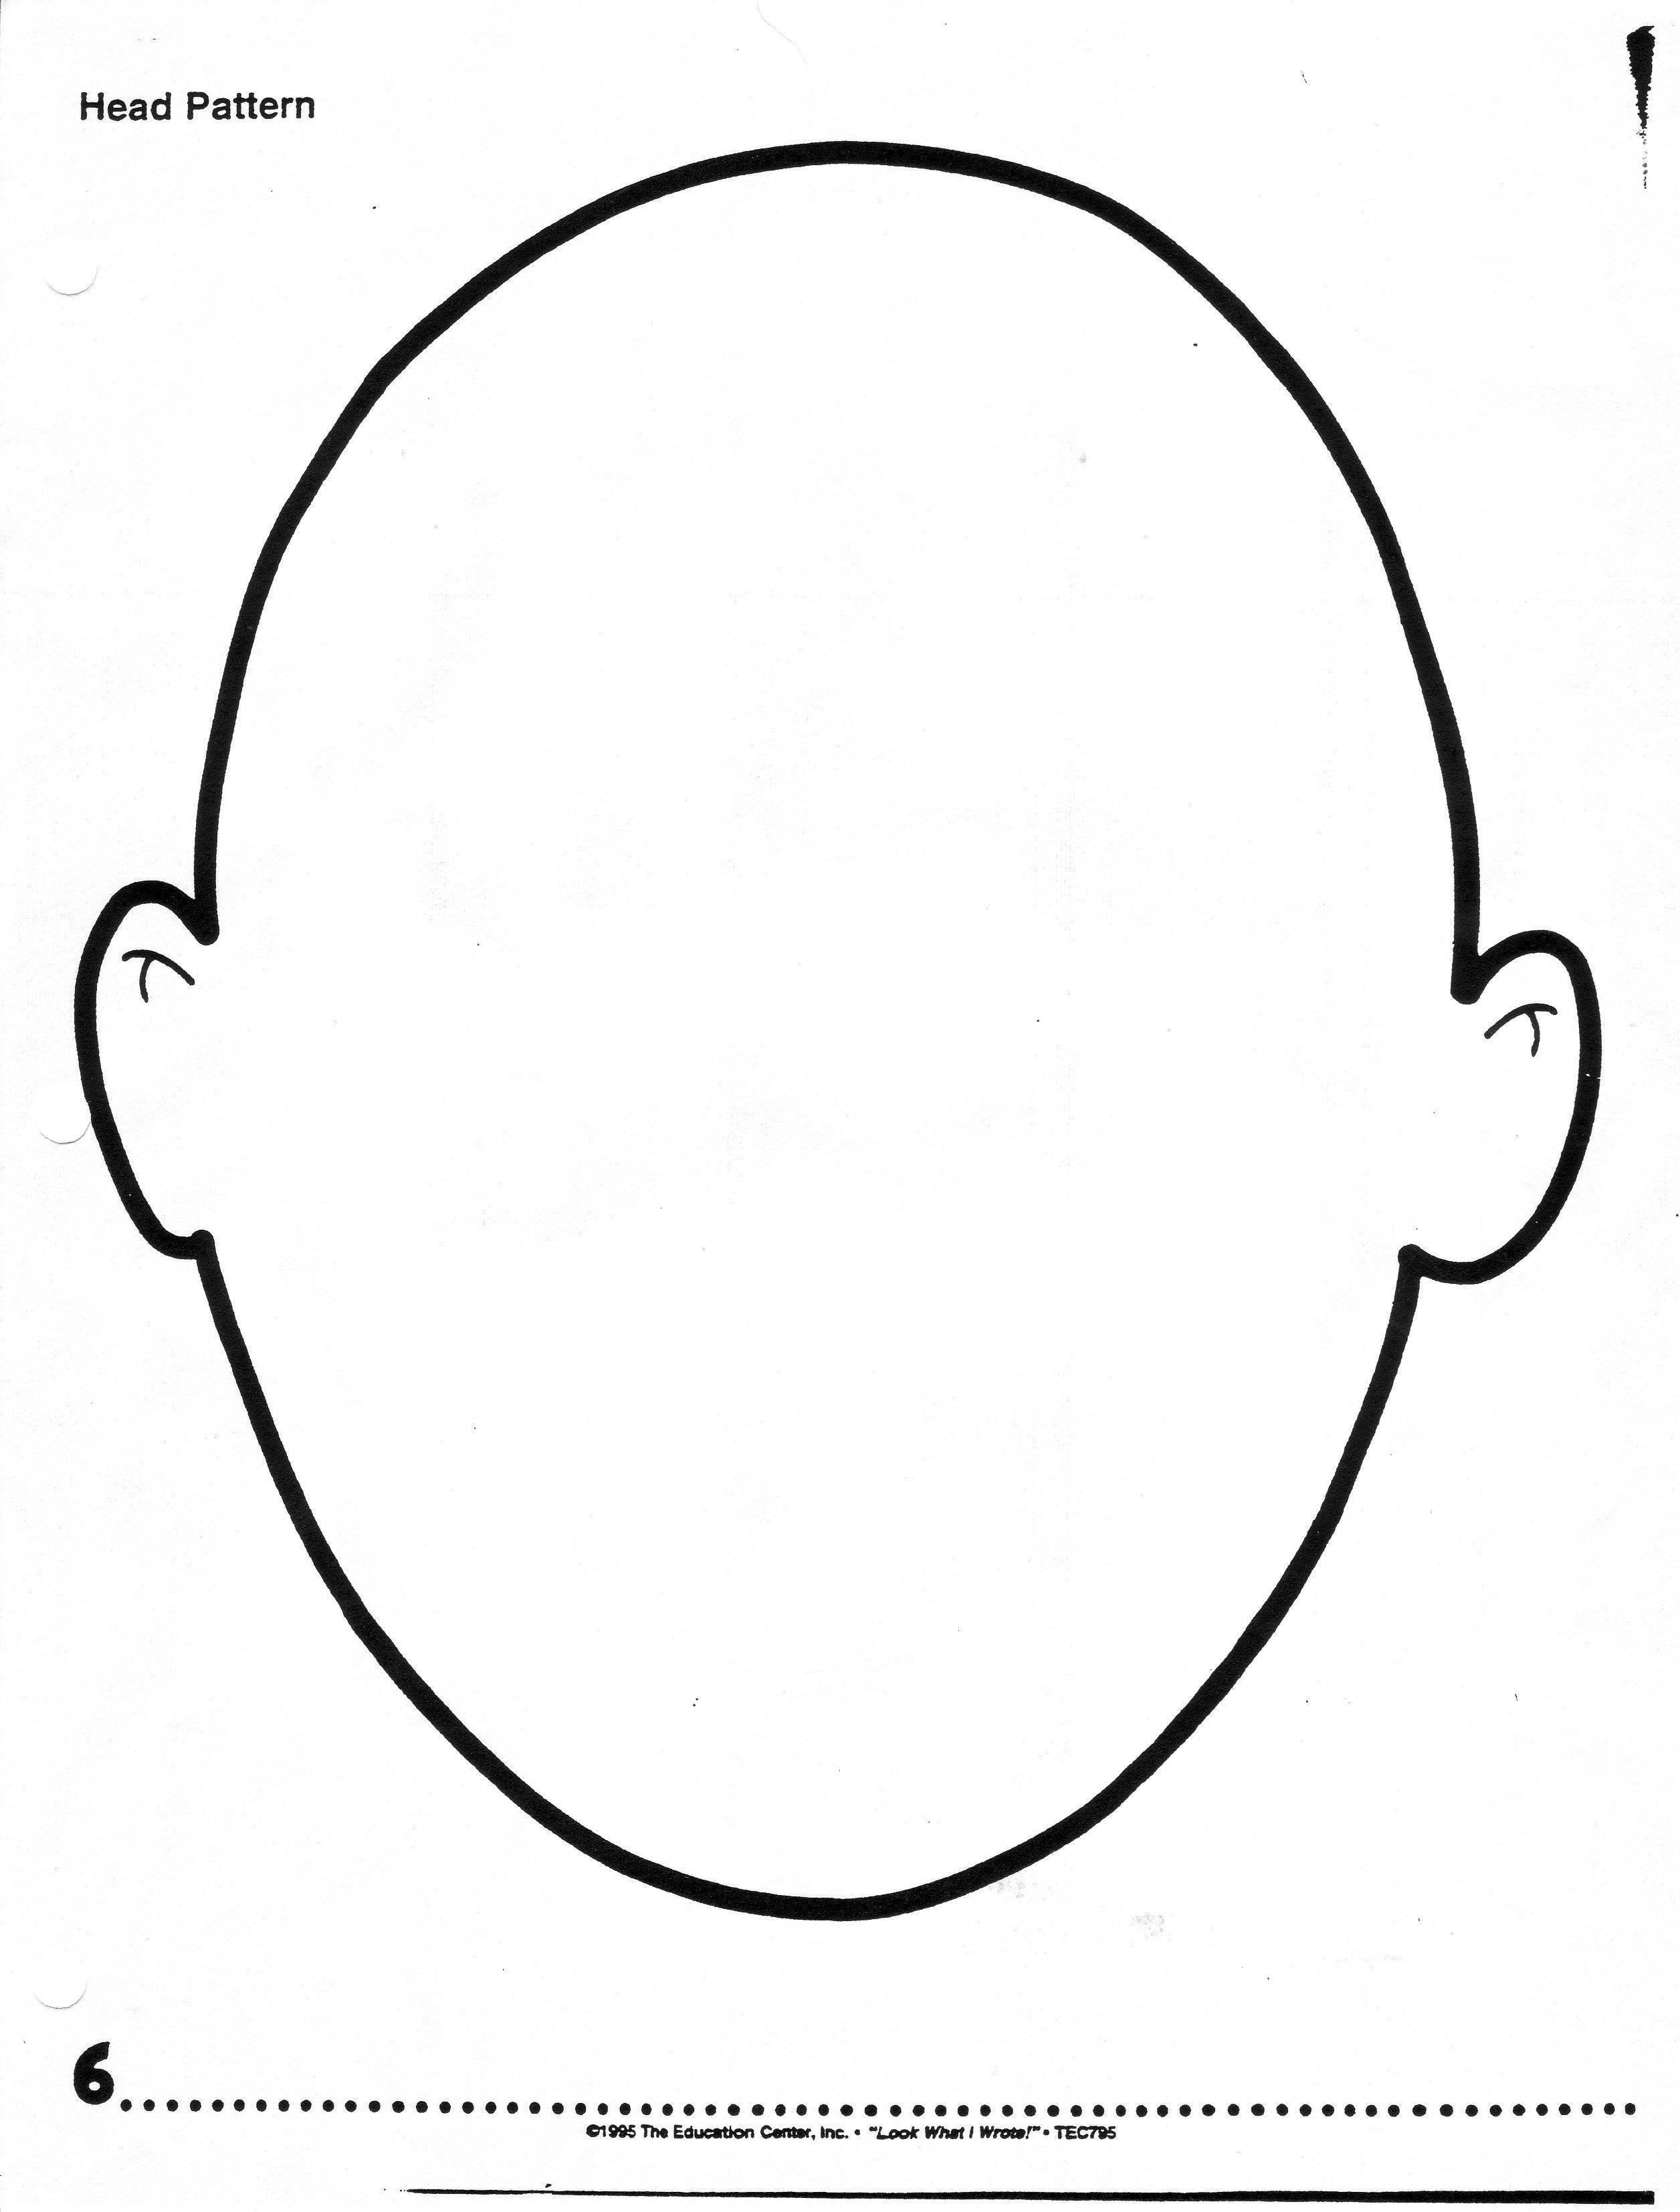 Alfa Img Showing Female Blank Head Outline School With Blank Face Template Preschool Cumed Org Face Template Face Outline Drawing For Kids [ 3308 x 2512 Pixel ]